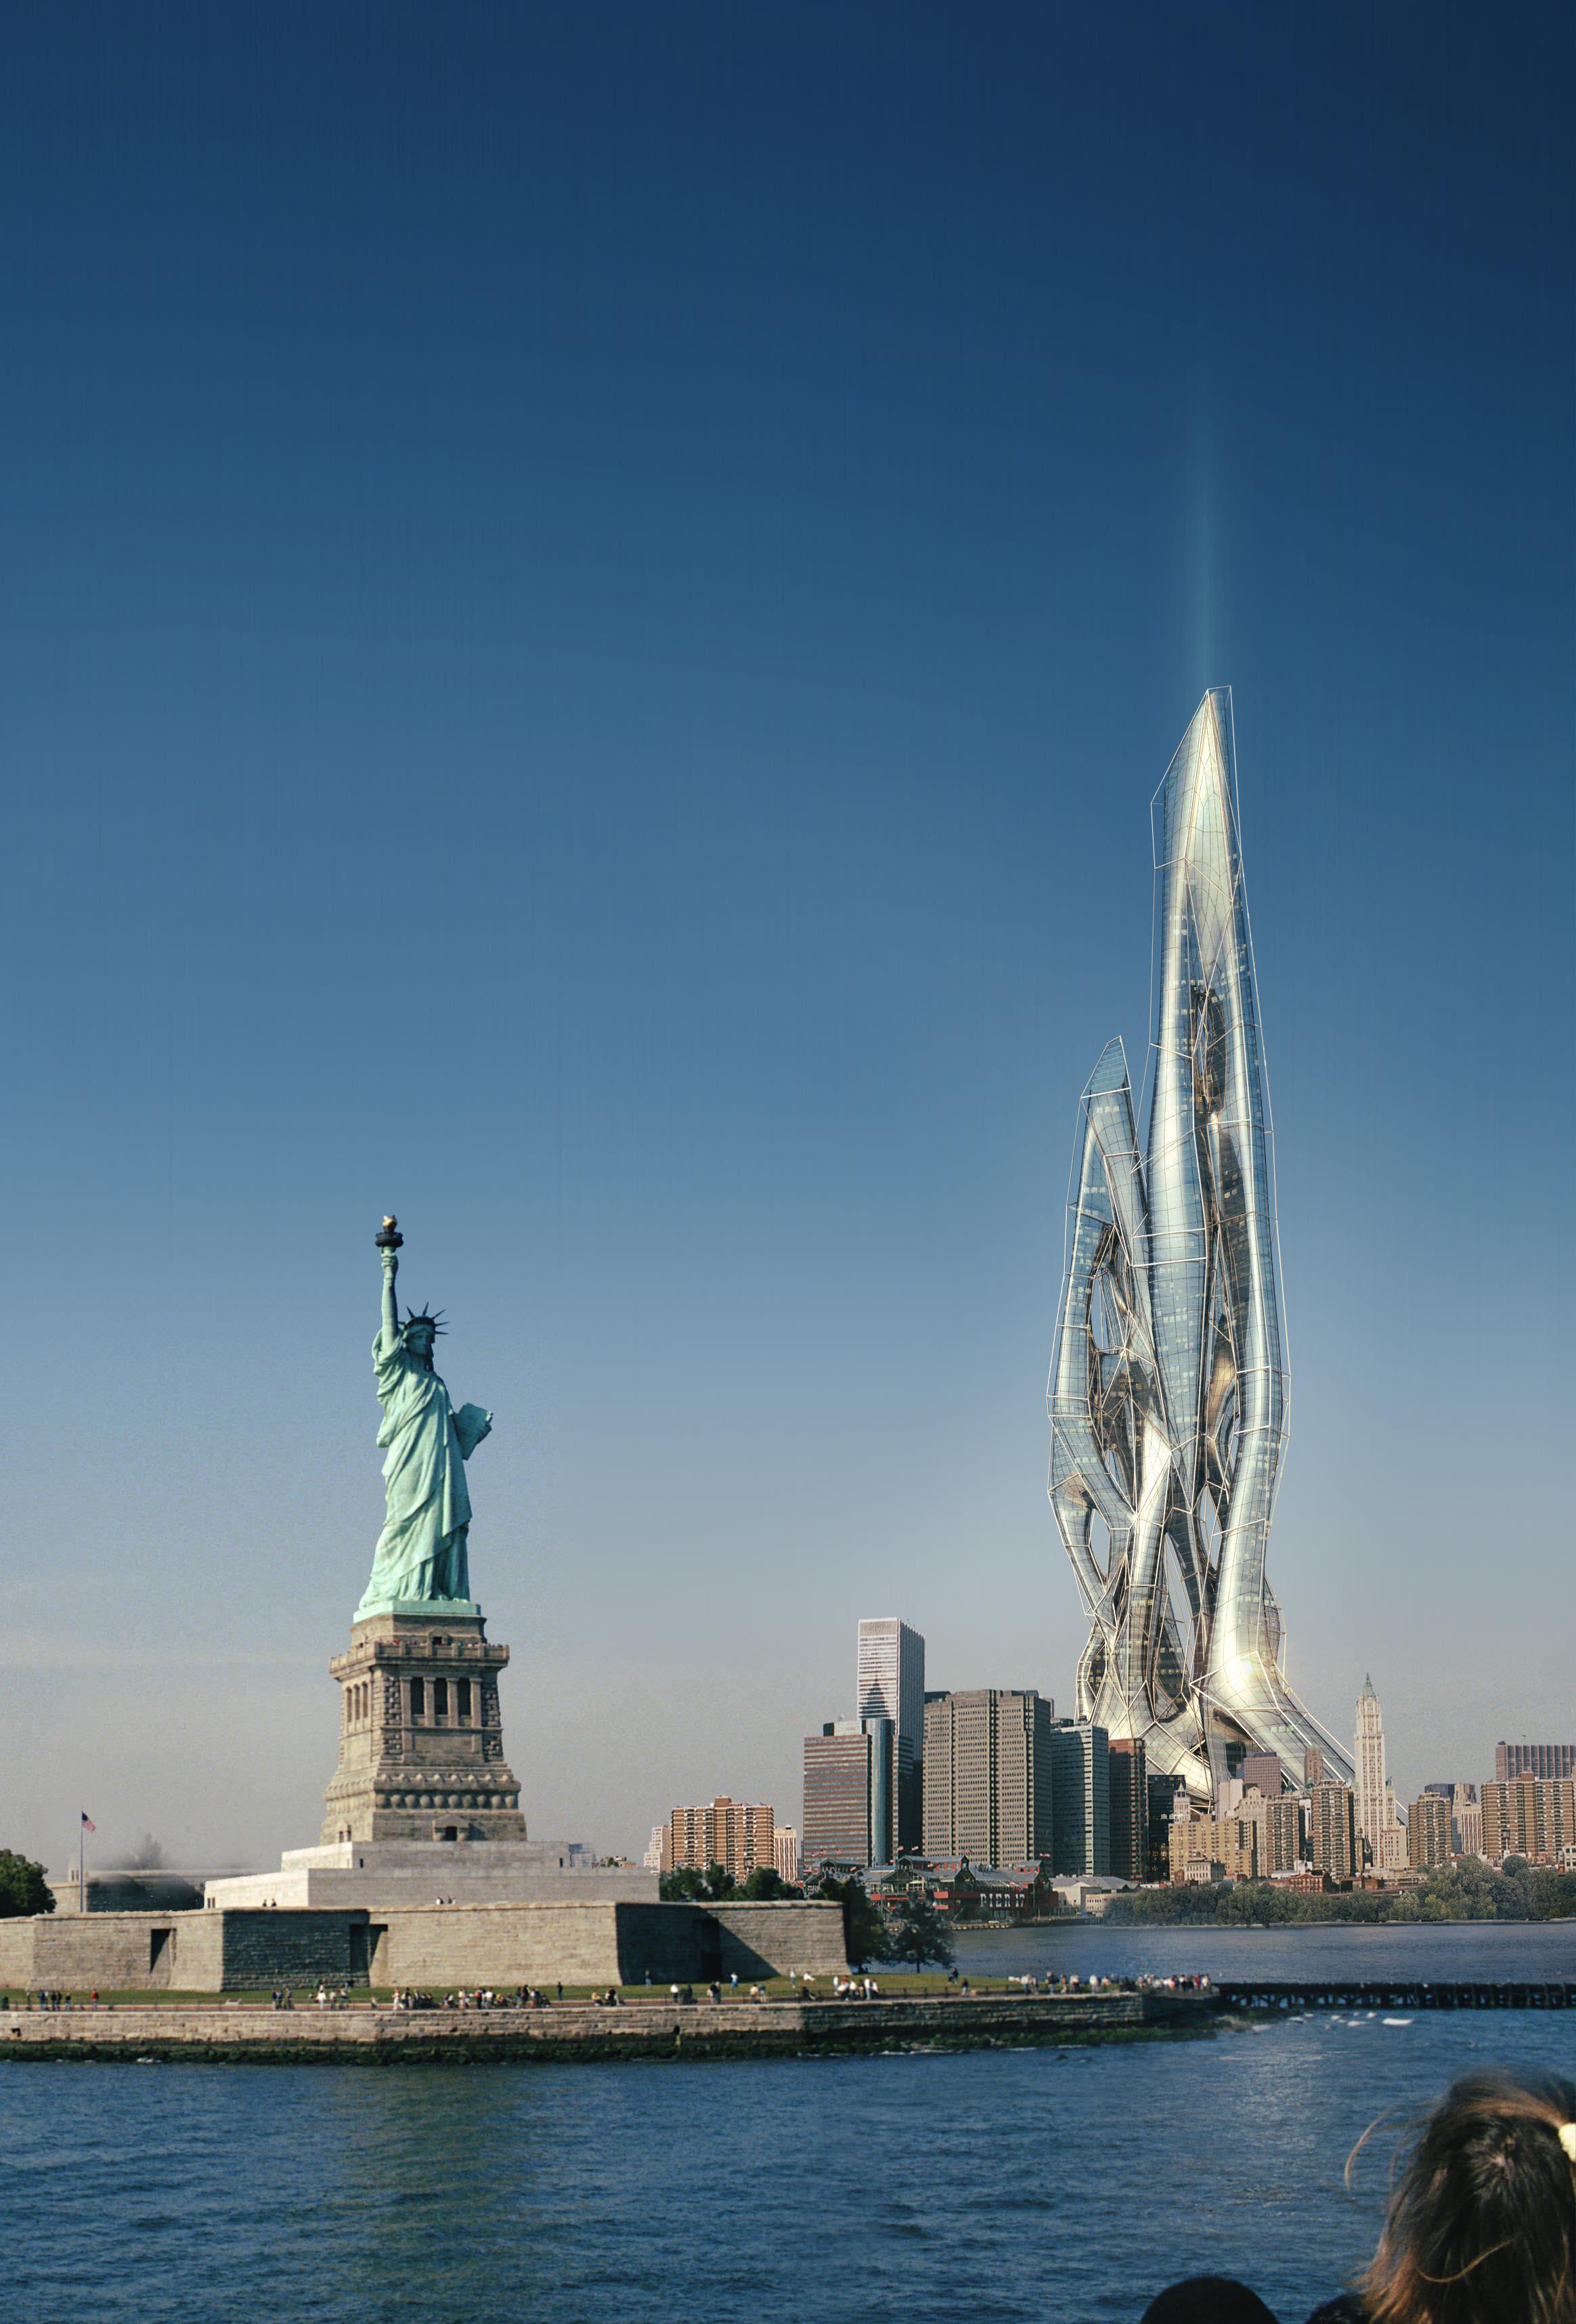 Futuristic Skyscraper In New York on Modern Asian House